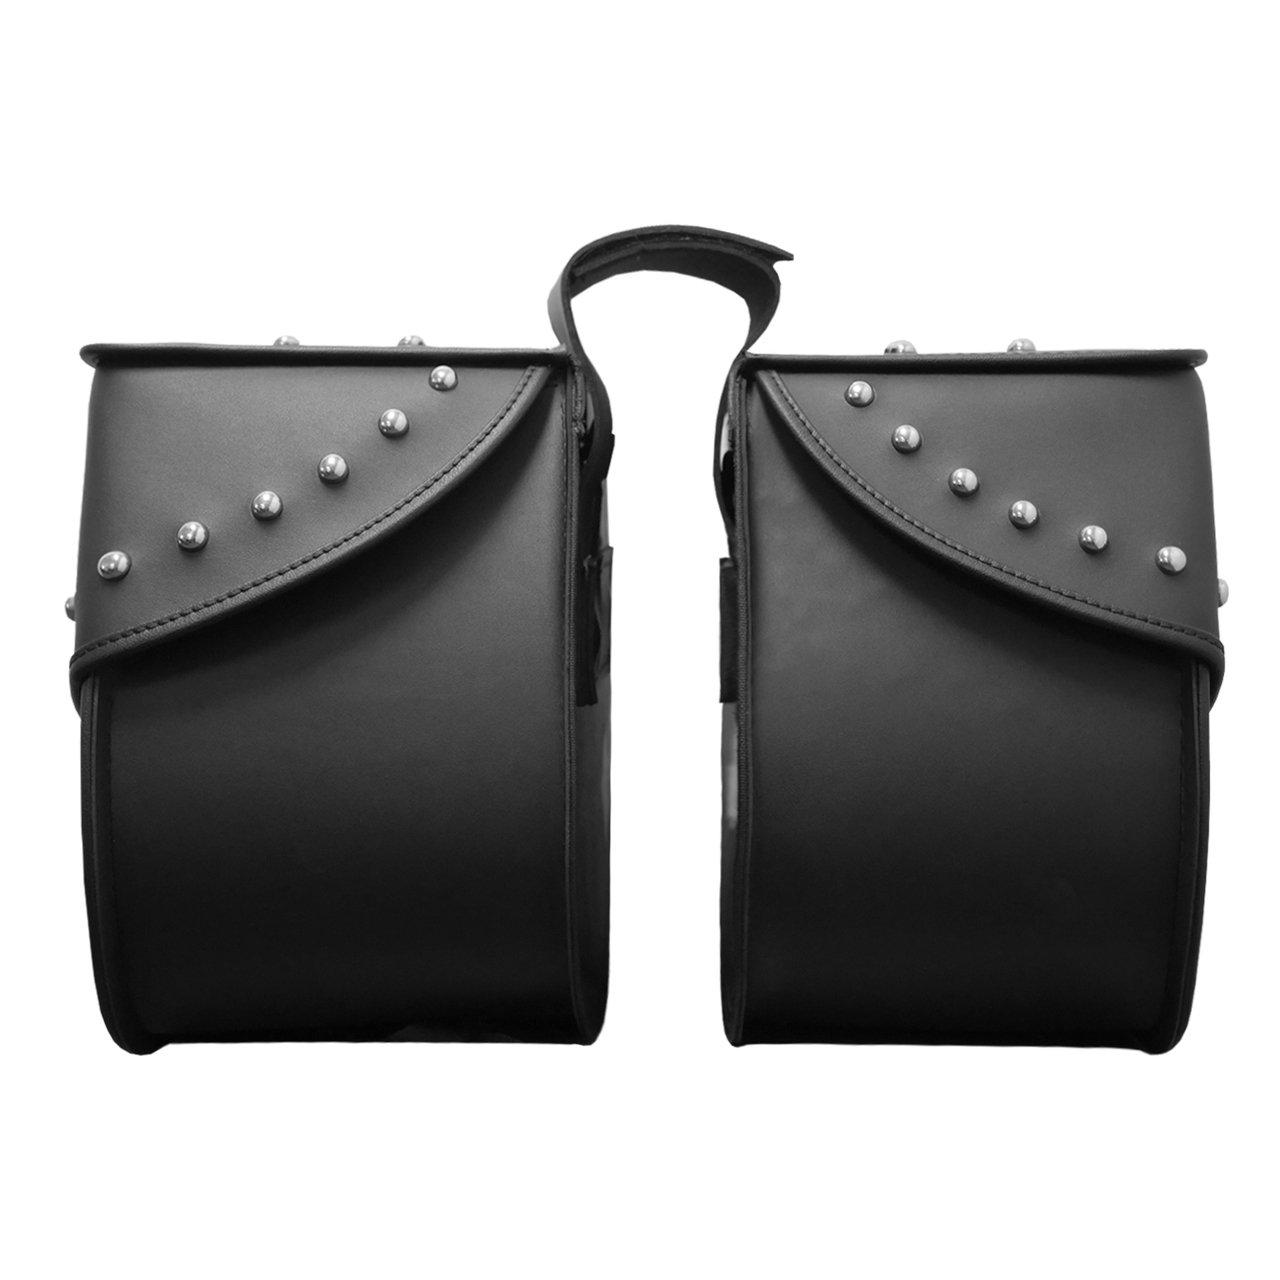 Plain Nomad USA Extra-Large Leather Throw-Over Motorcycle Saddlebags